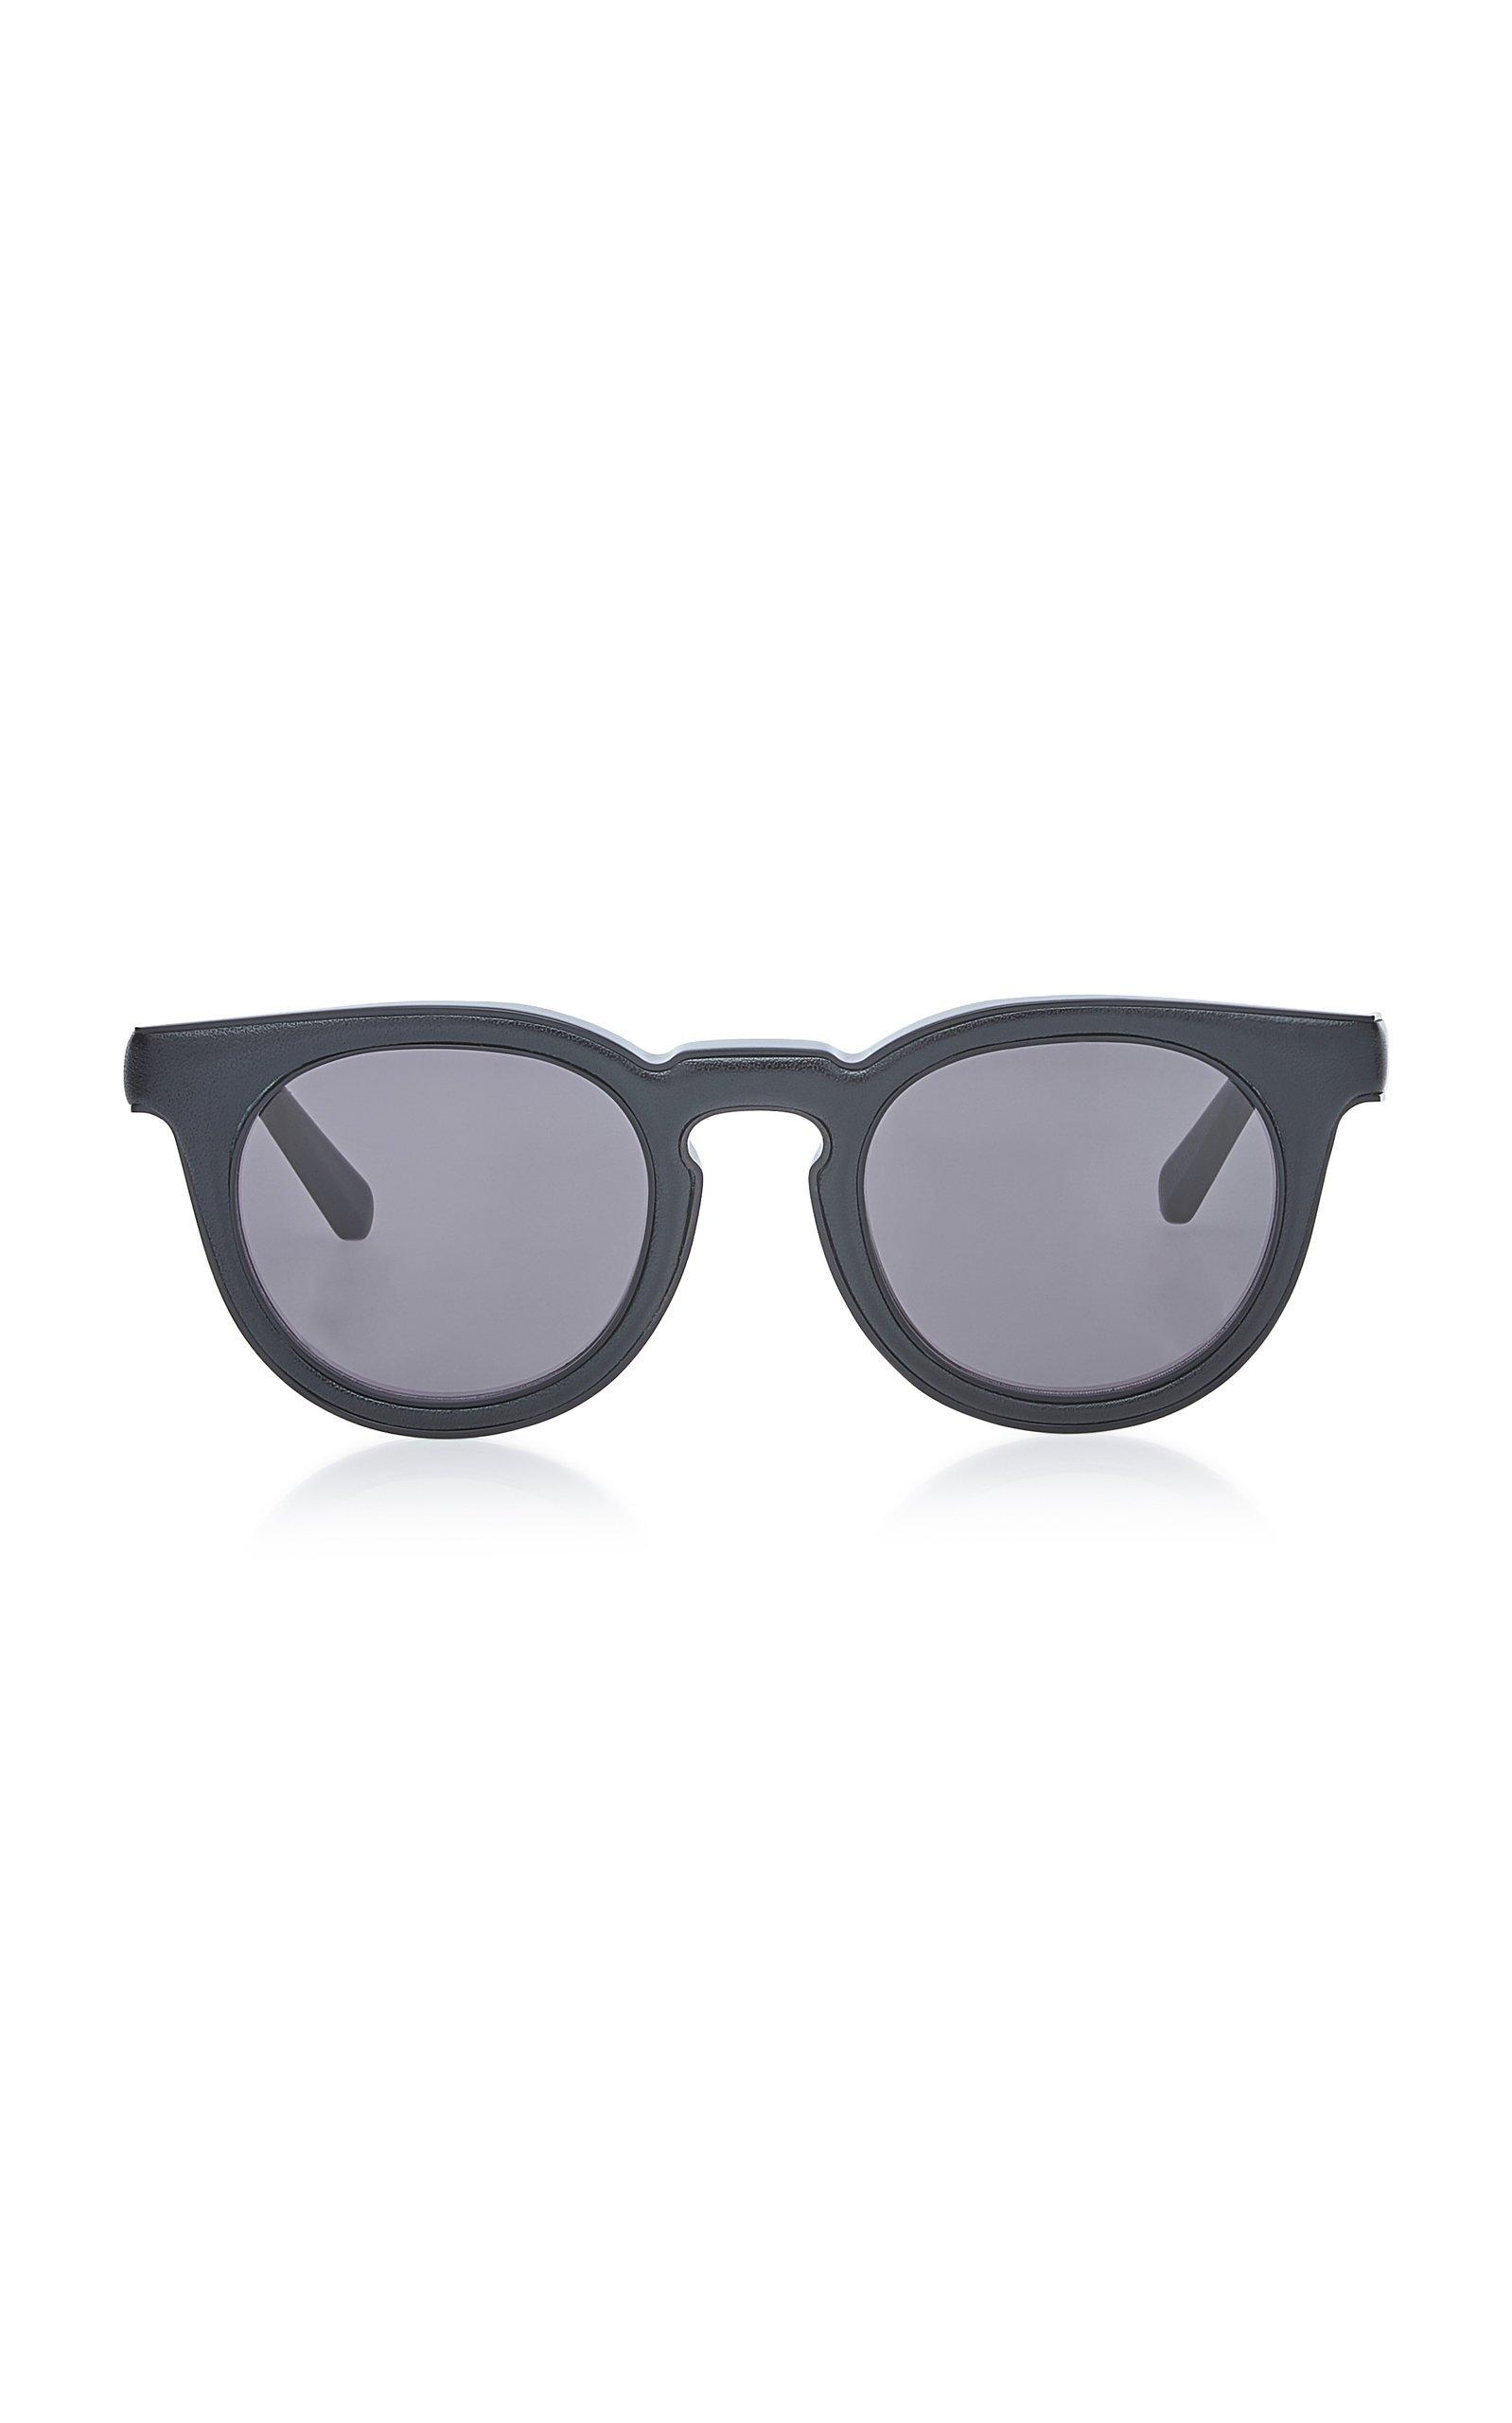 Loewe Sunglasses Oversized Round Acetate Sunglasses